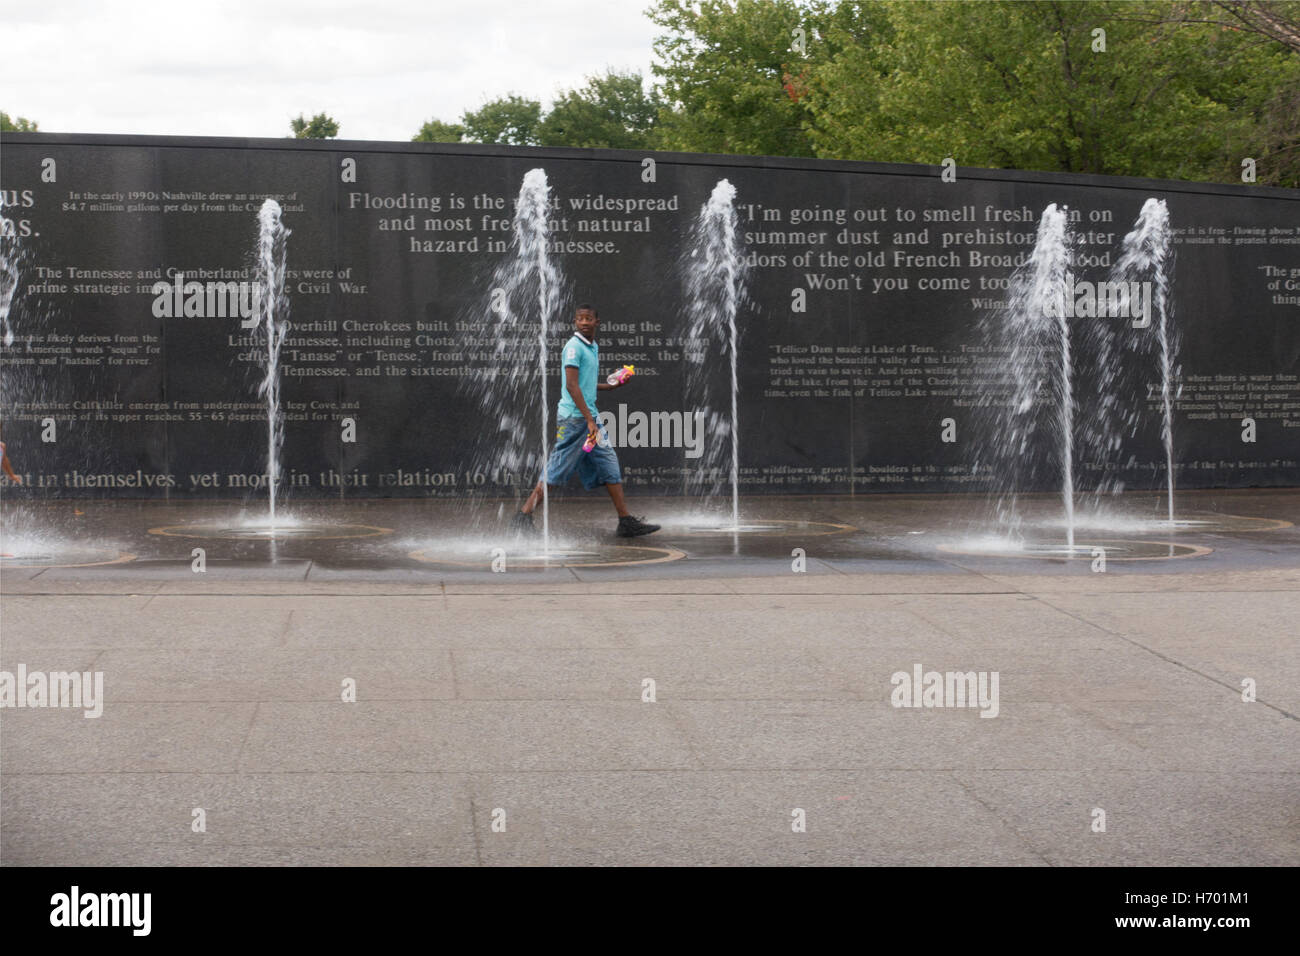 Bicentennial park water fountains Nashville TN - Stock Image